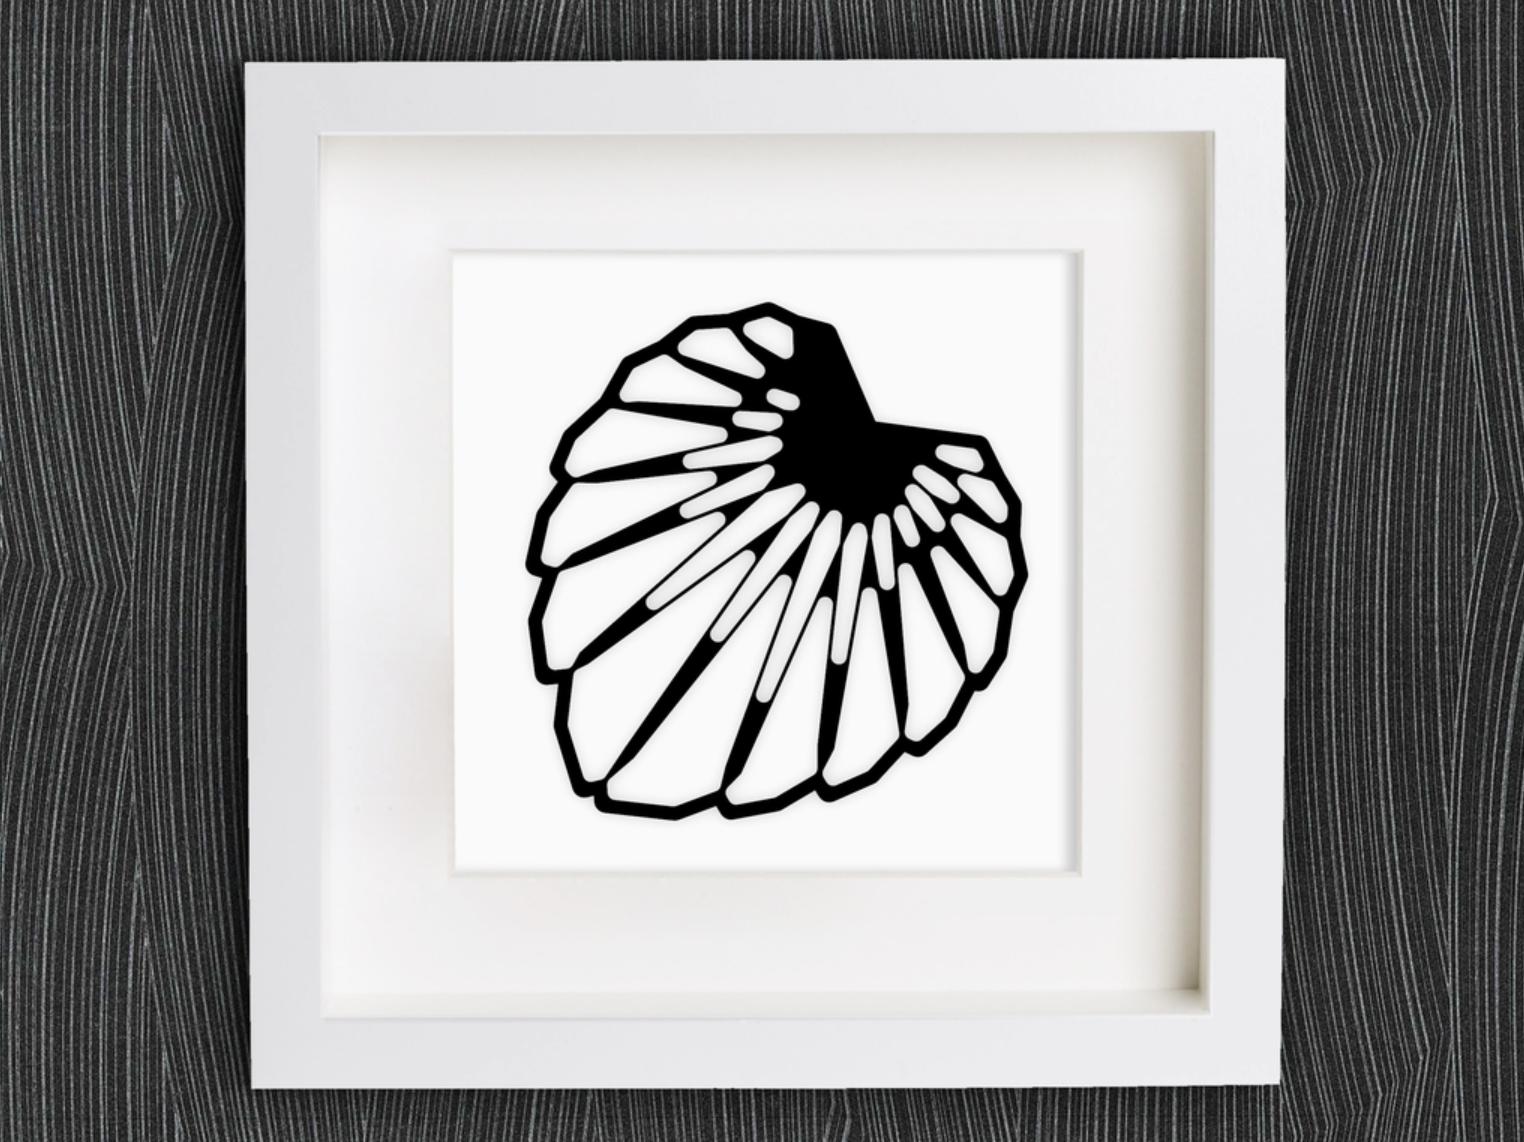 Capture d'écran 2018-01-15 à 10.47.33.png Download free STL file Customizable Origami Monstera Leaf • 3D printer template, MightyNozzle